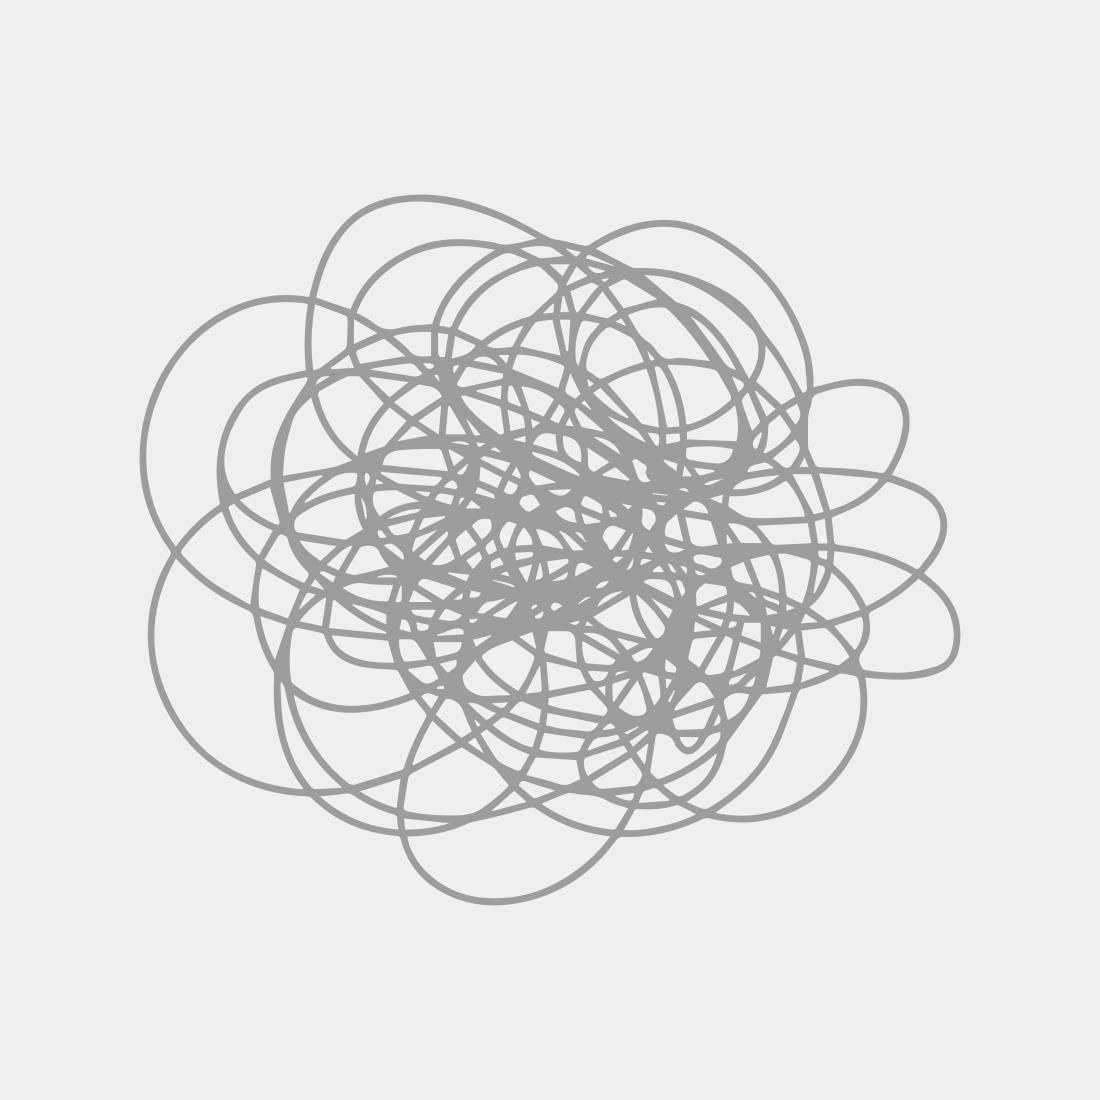 Albert Irvin OBE RA Untitled opus w.22 (framed)